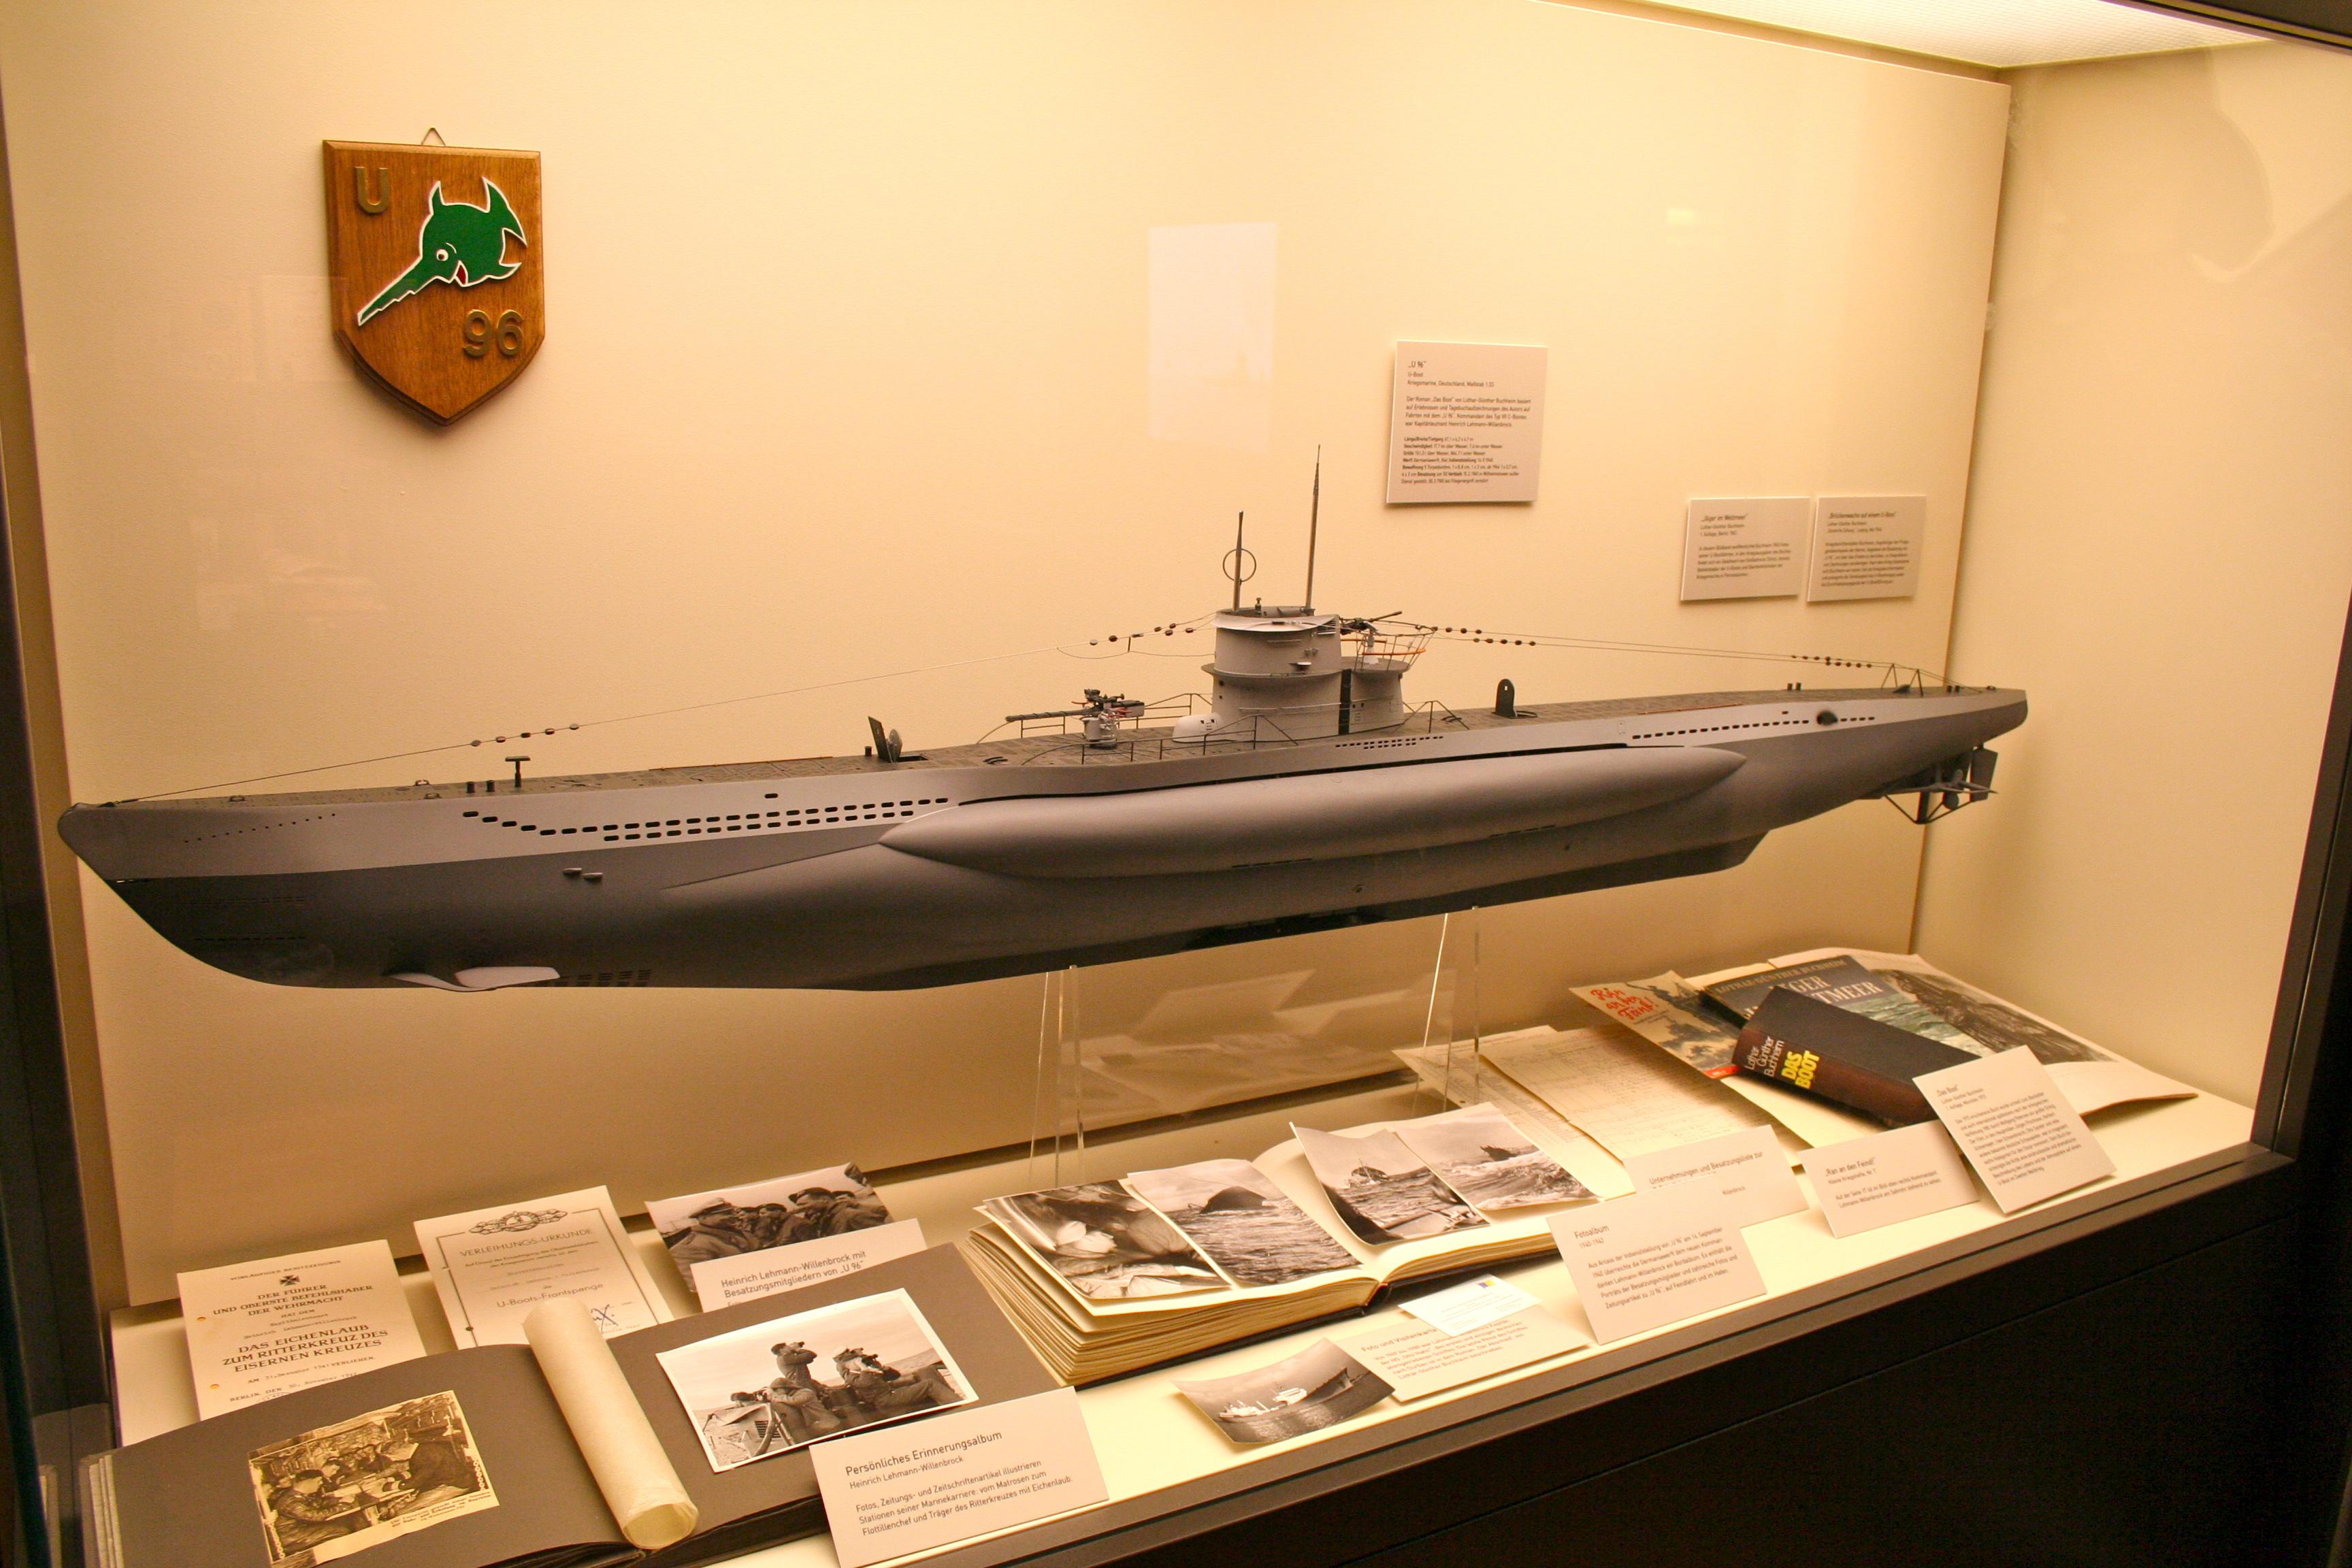 u 96 (kriegsmarine) – wikipedia